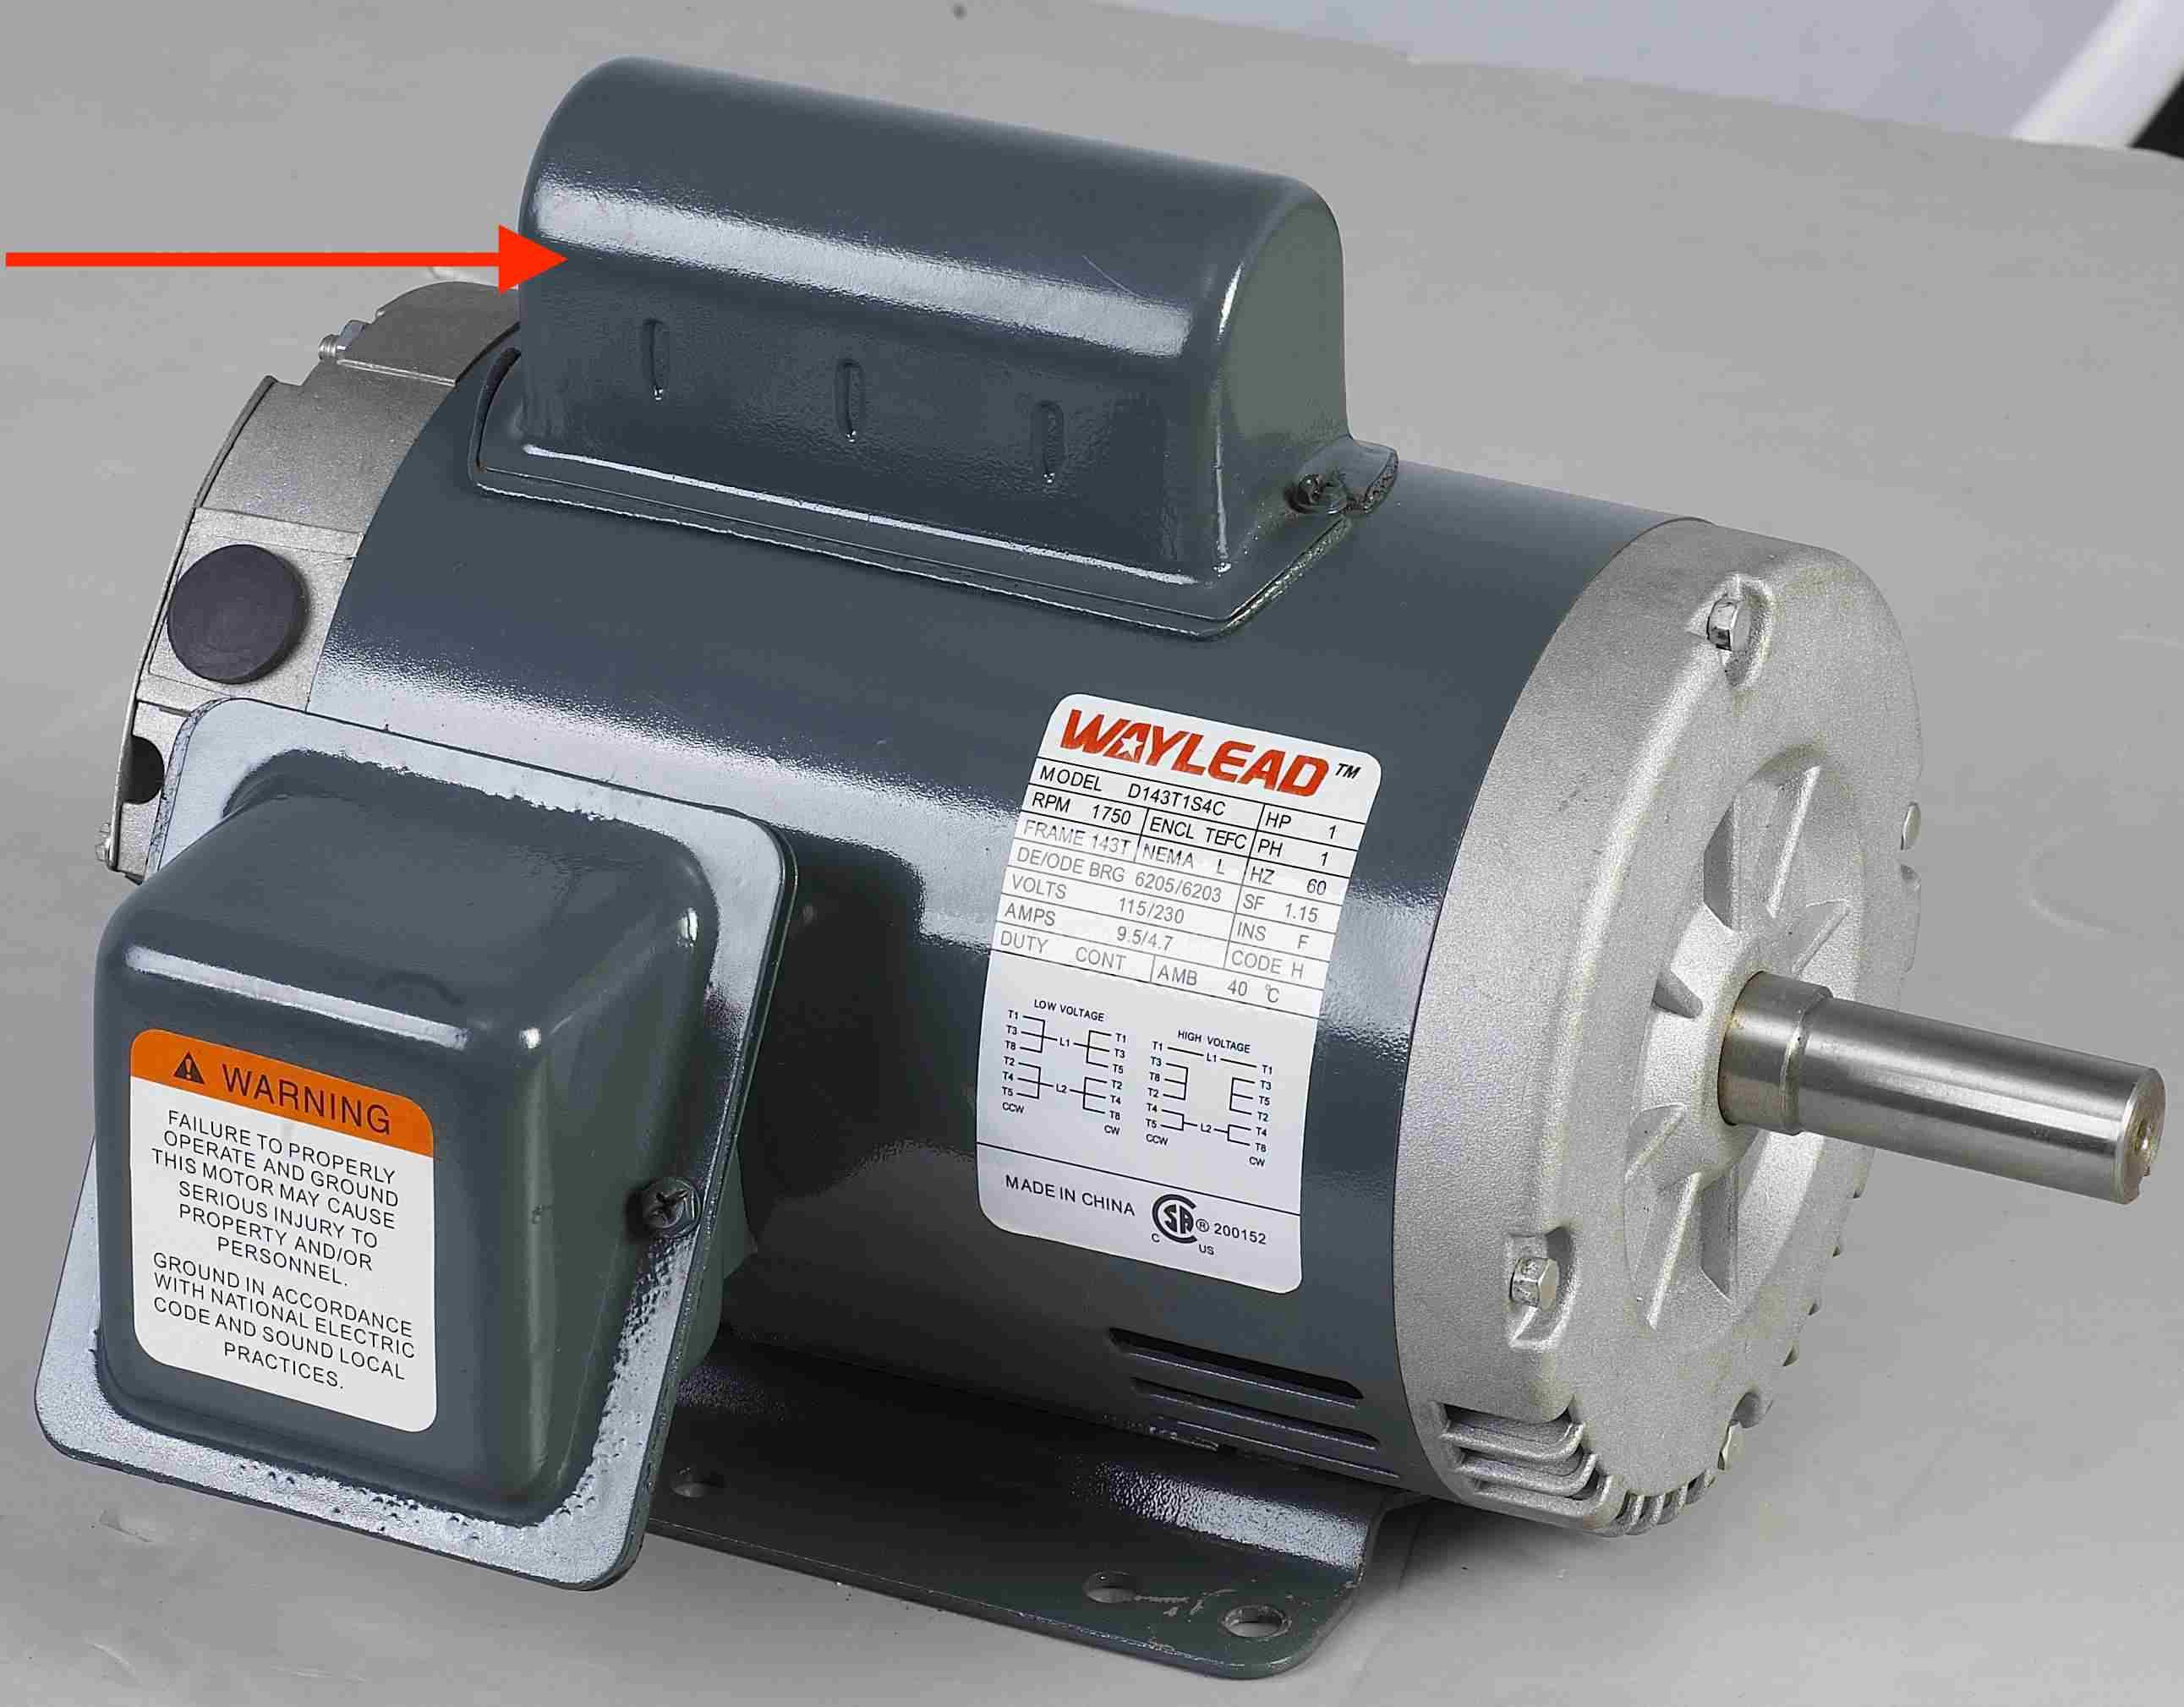 1132ee1d-55de-408e-984a-c6086a47fbe7_Odp-56-Single-Phase-Capacitor-Start-NEMA-Motor.jpg